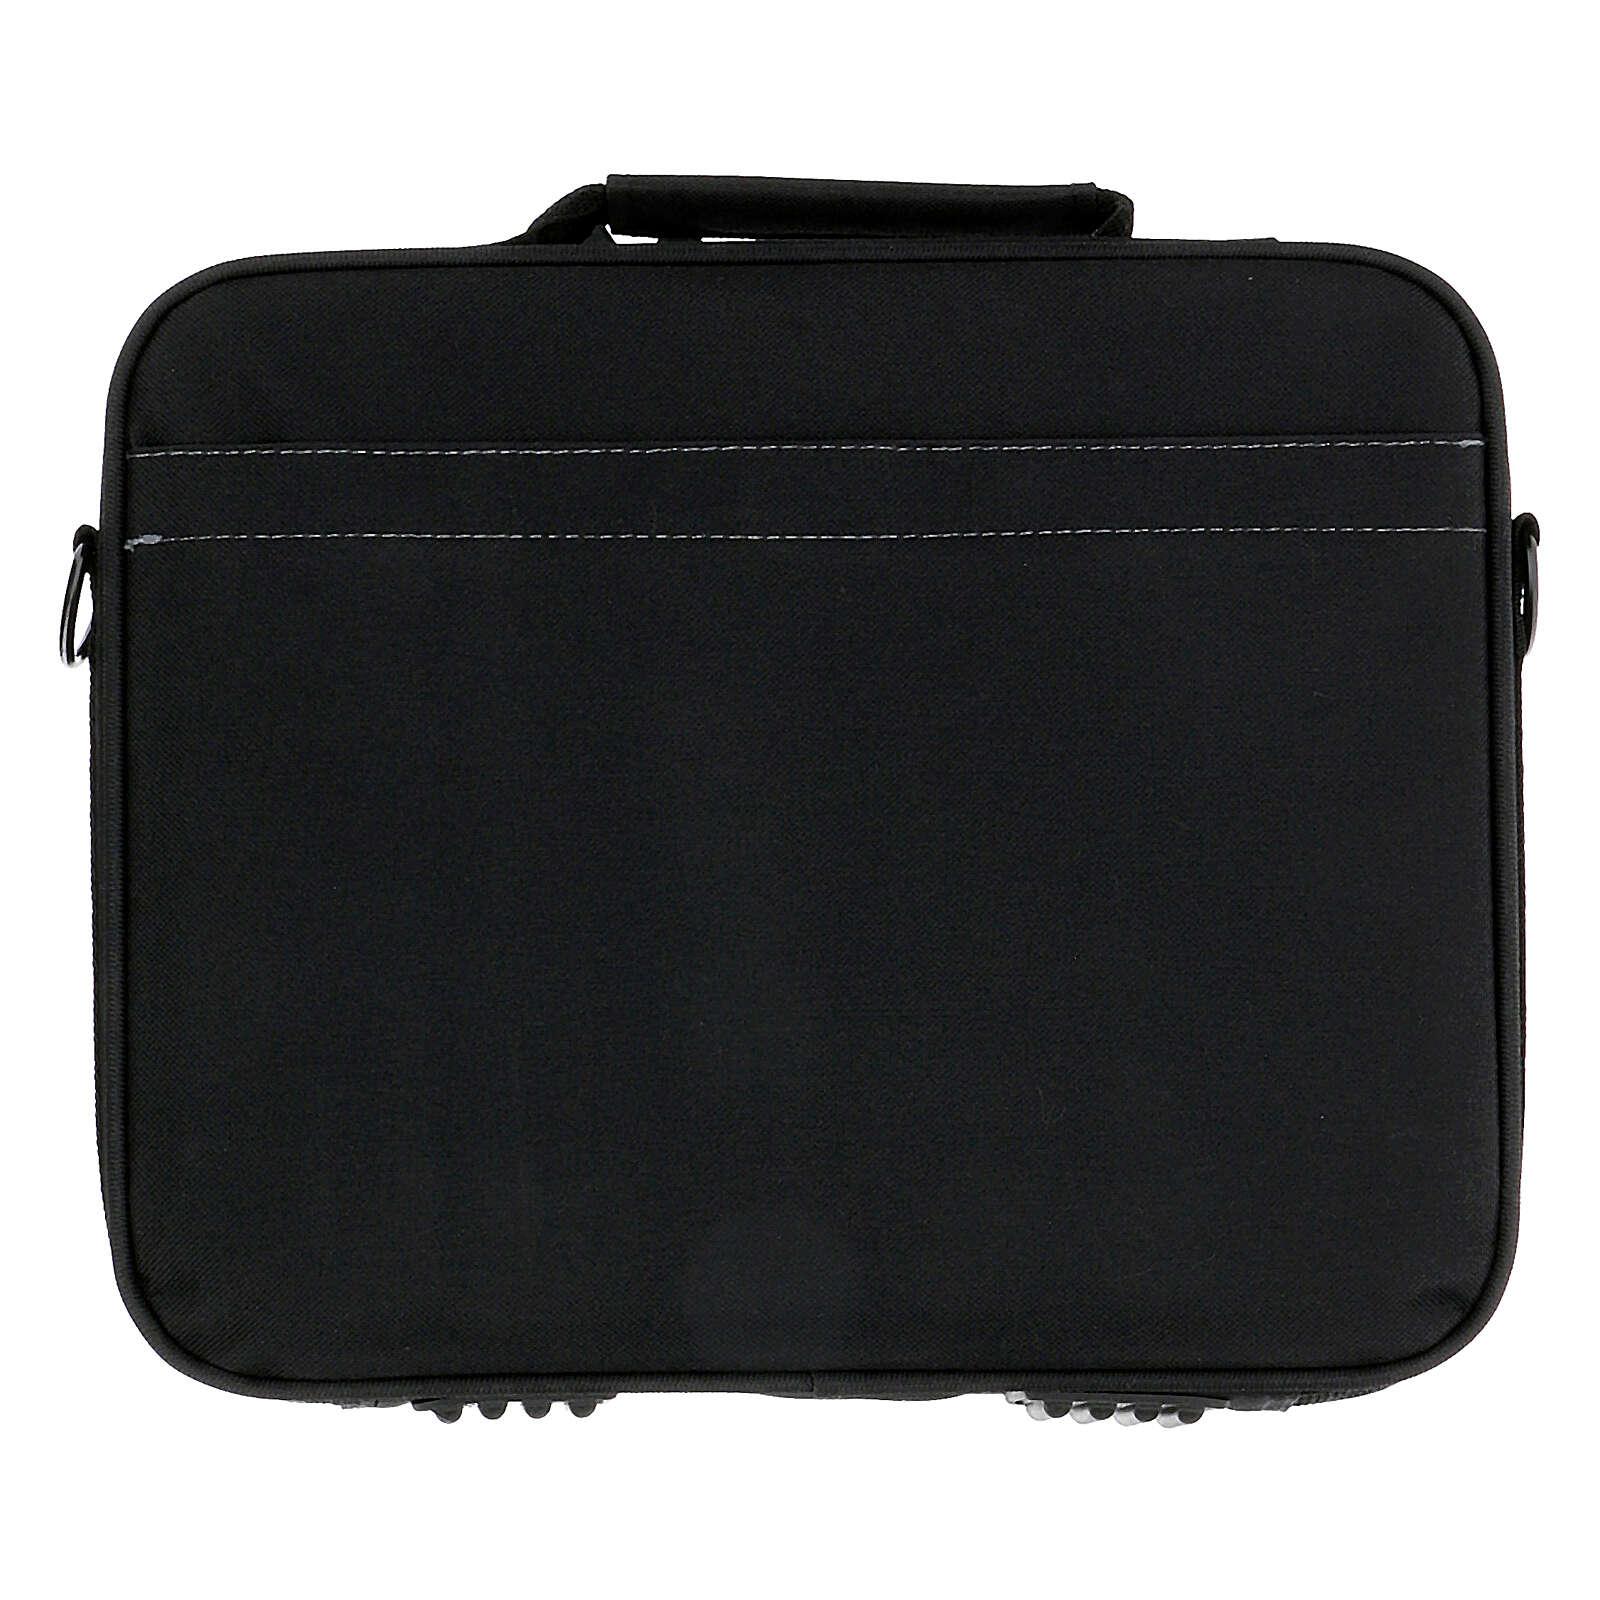 Mini computer bag with mass kit and blue jacquard lining 3